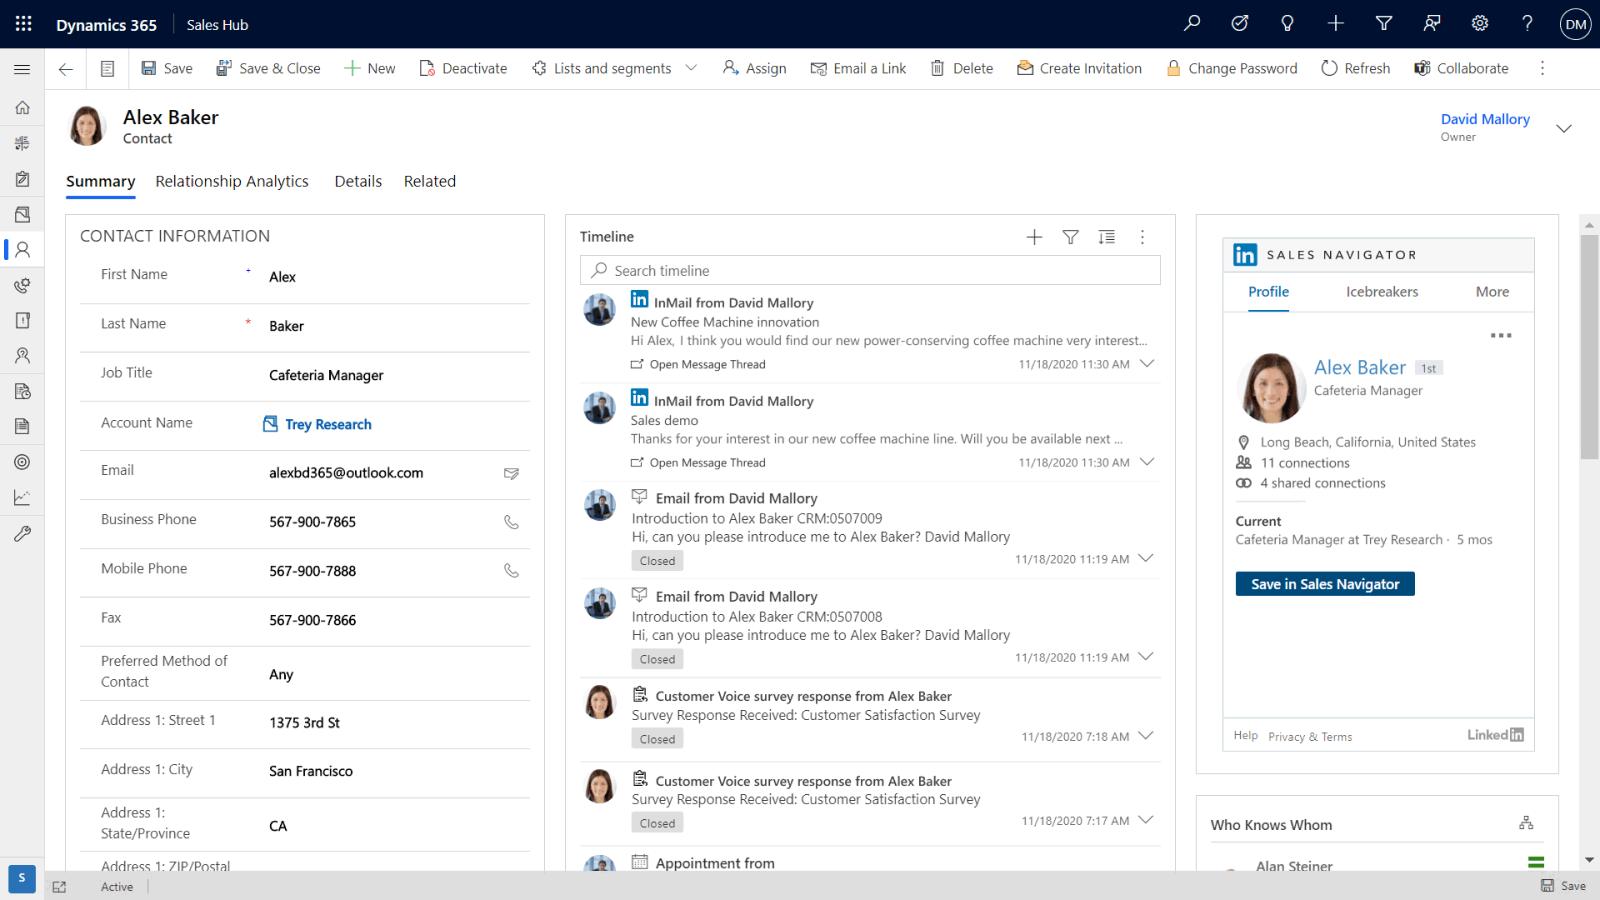 Get insights from LinkedIn Sales Navigator